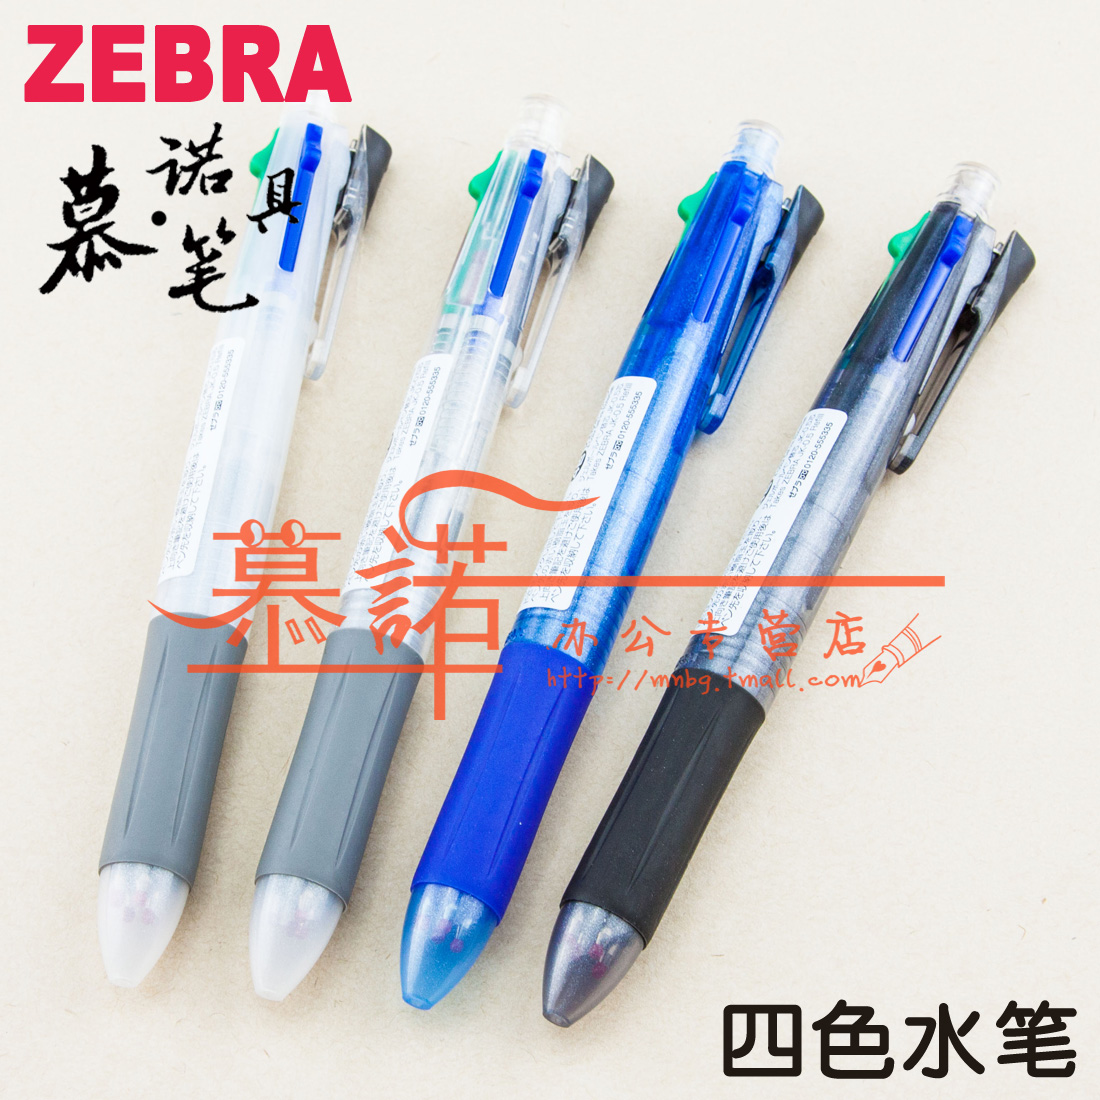 Ручка ZEBRA  J4J1 zebra